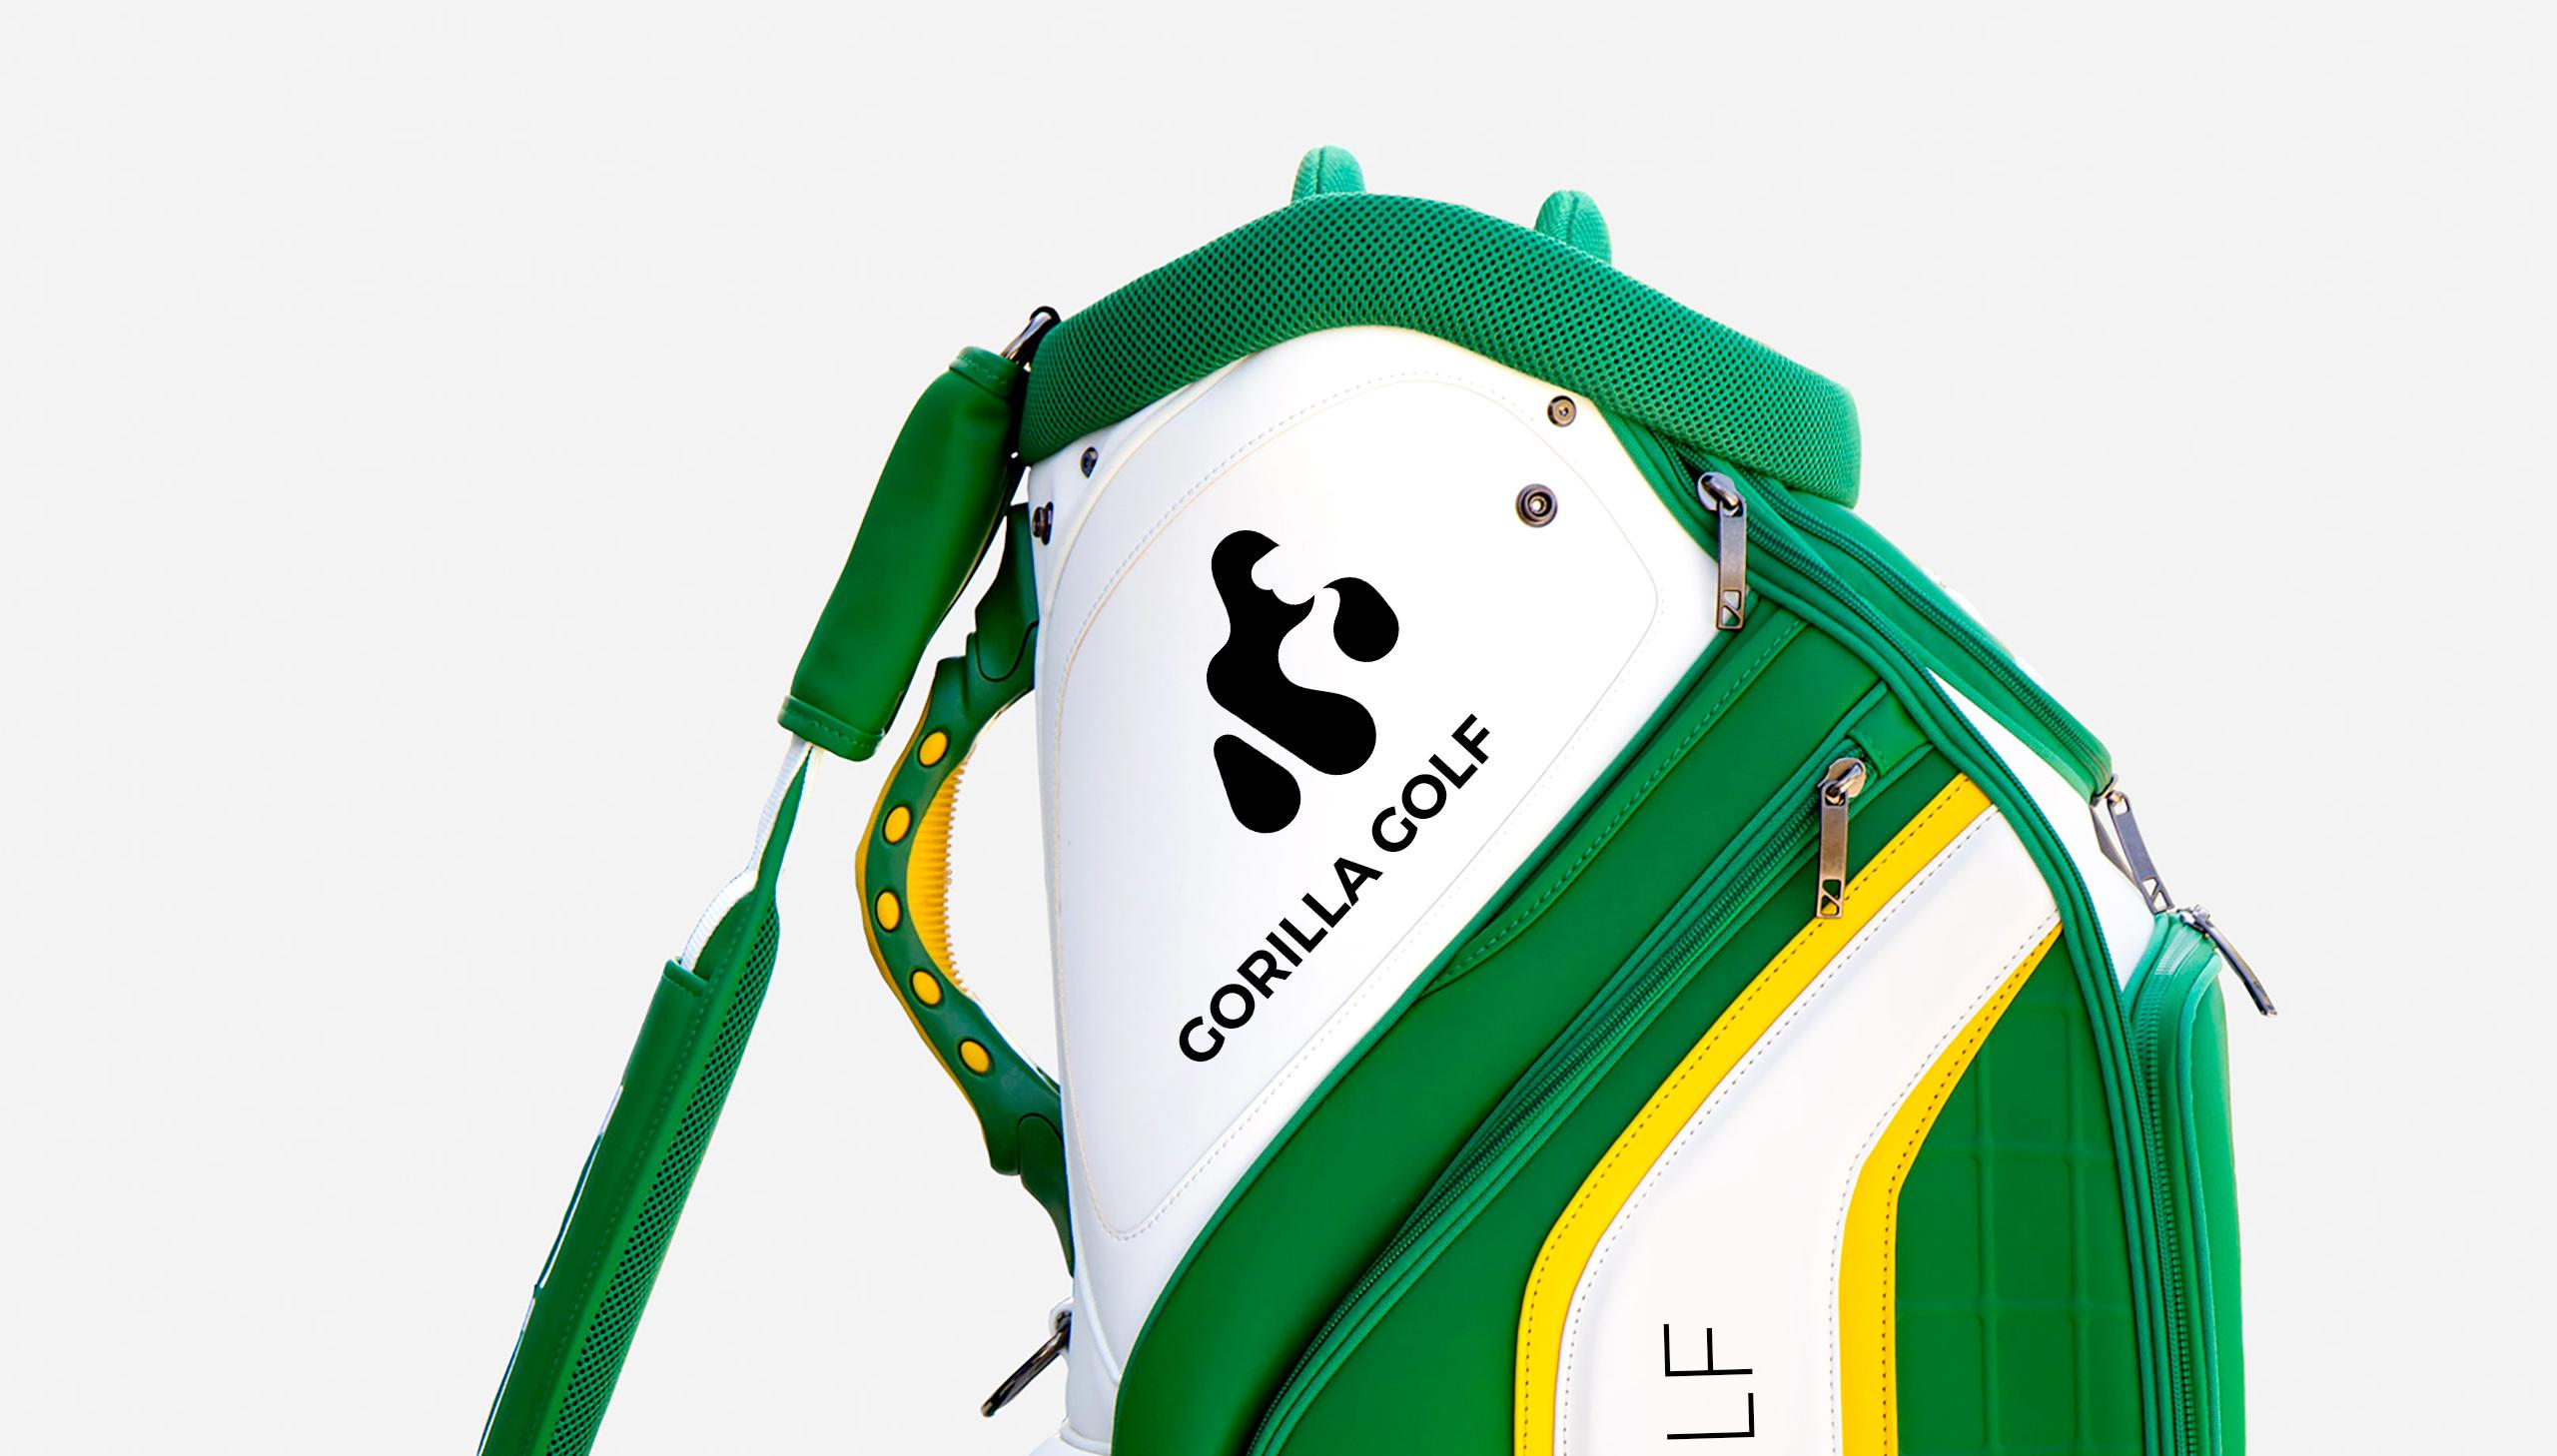 Gorilla Golf Branding Logobou Design 3